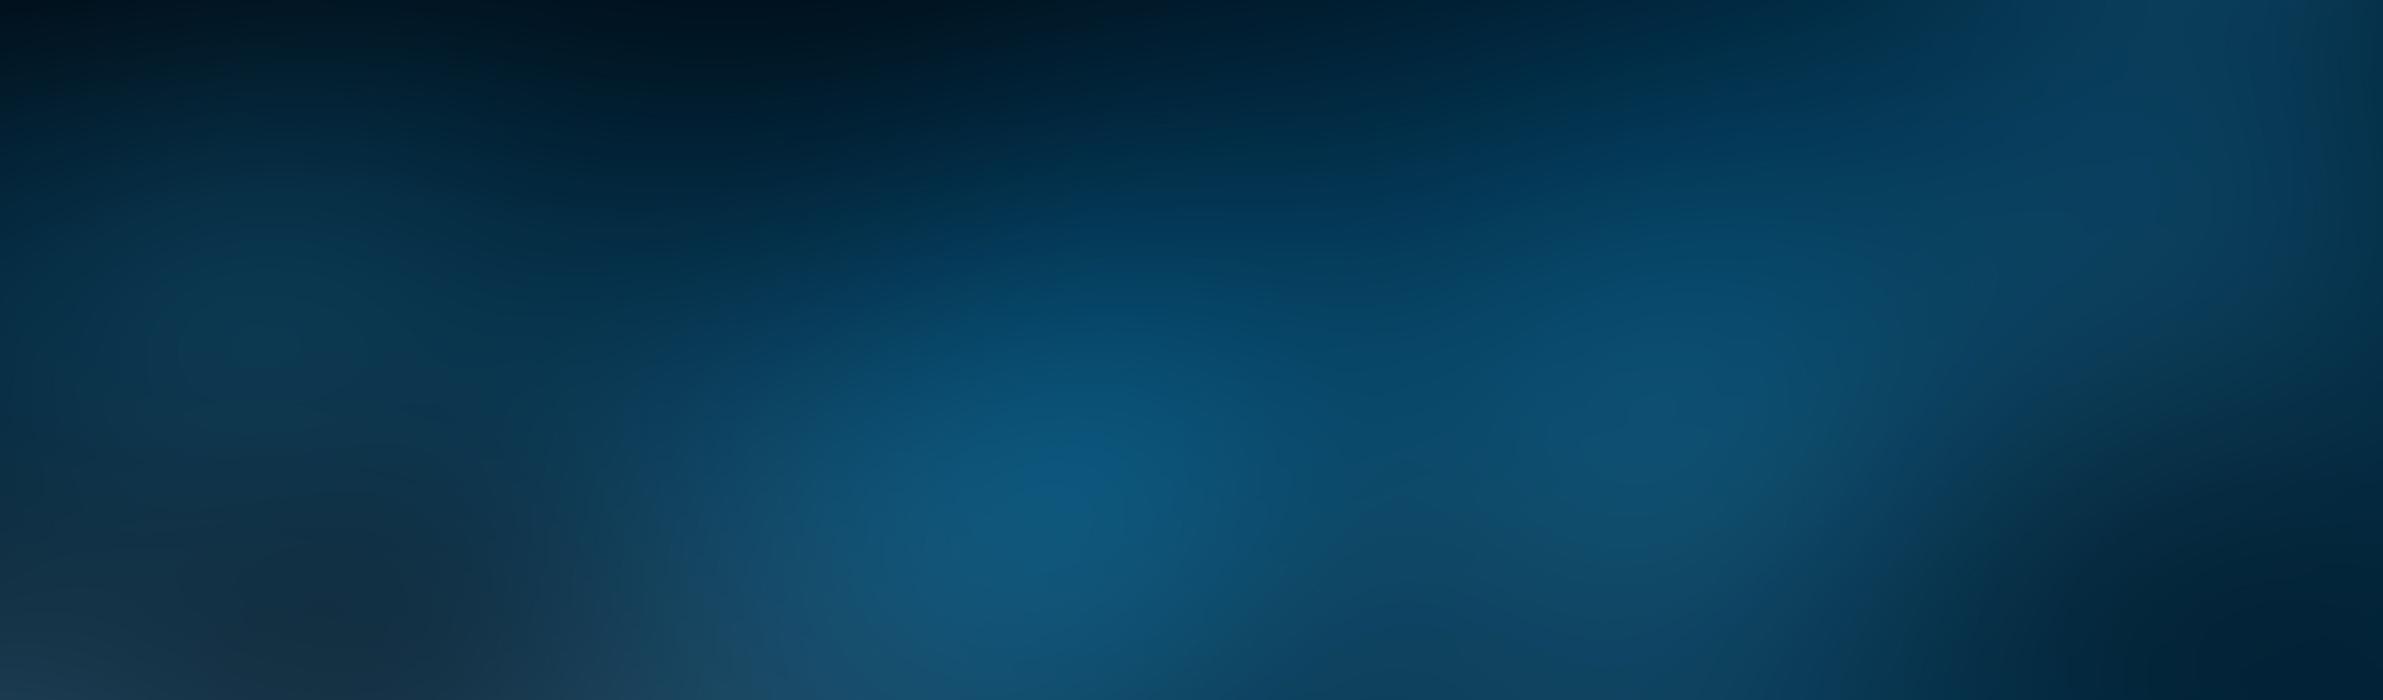 blue-blur